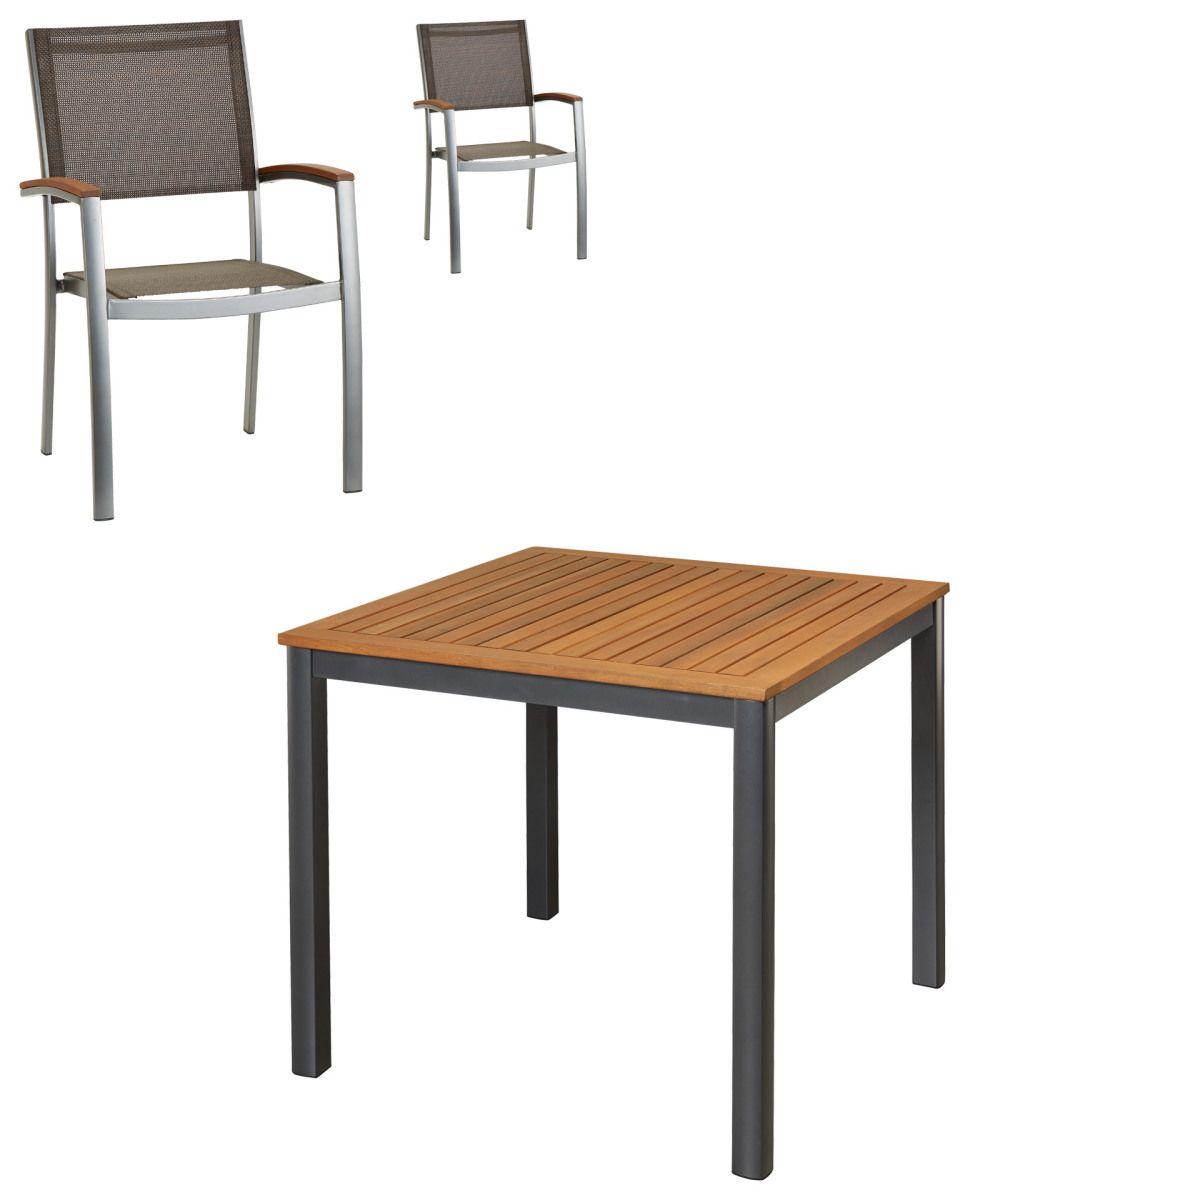 Gartenmöbel-Set San Francisco/Santiago (90x90, 2 Stühle) Jetzt ...